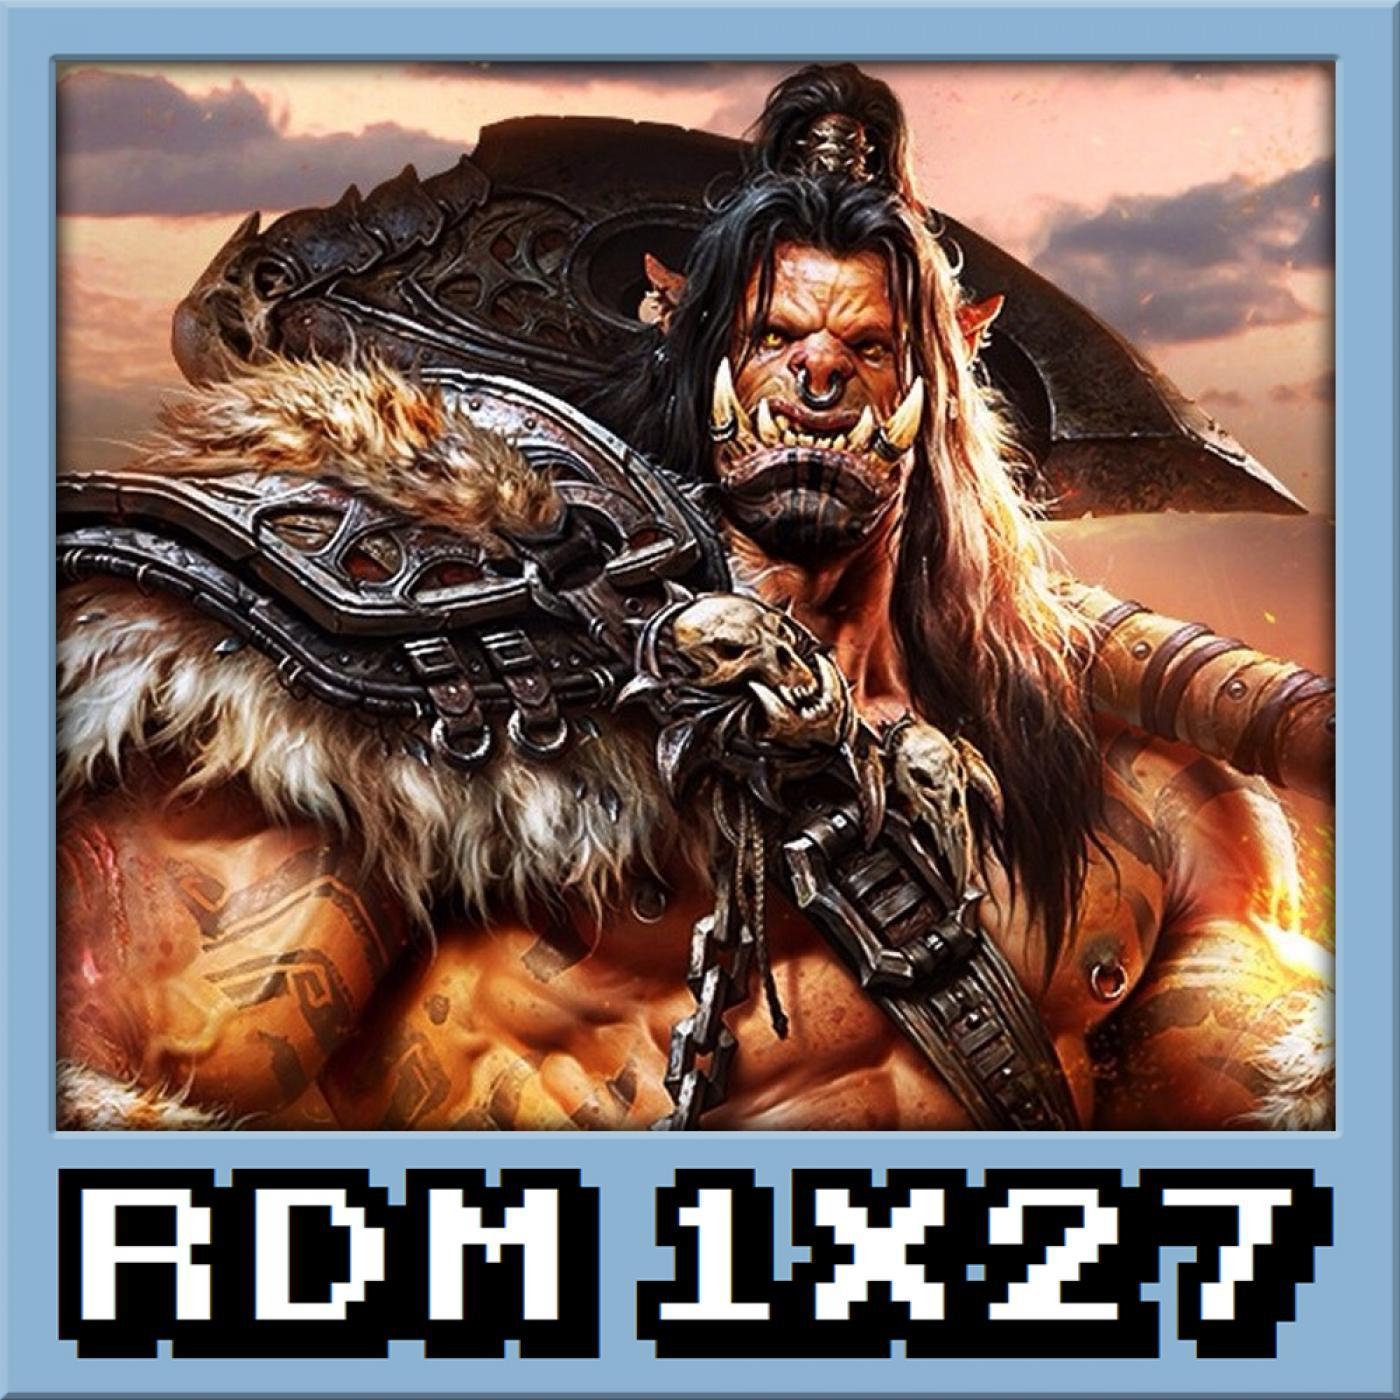 RDM 1x27 – World of Warcraft: Warlords of Draenor